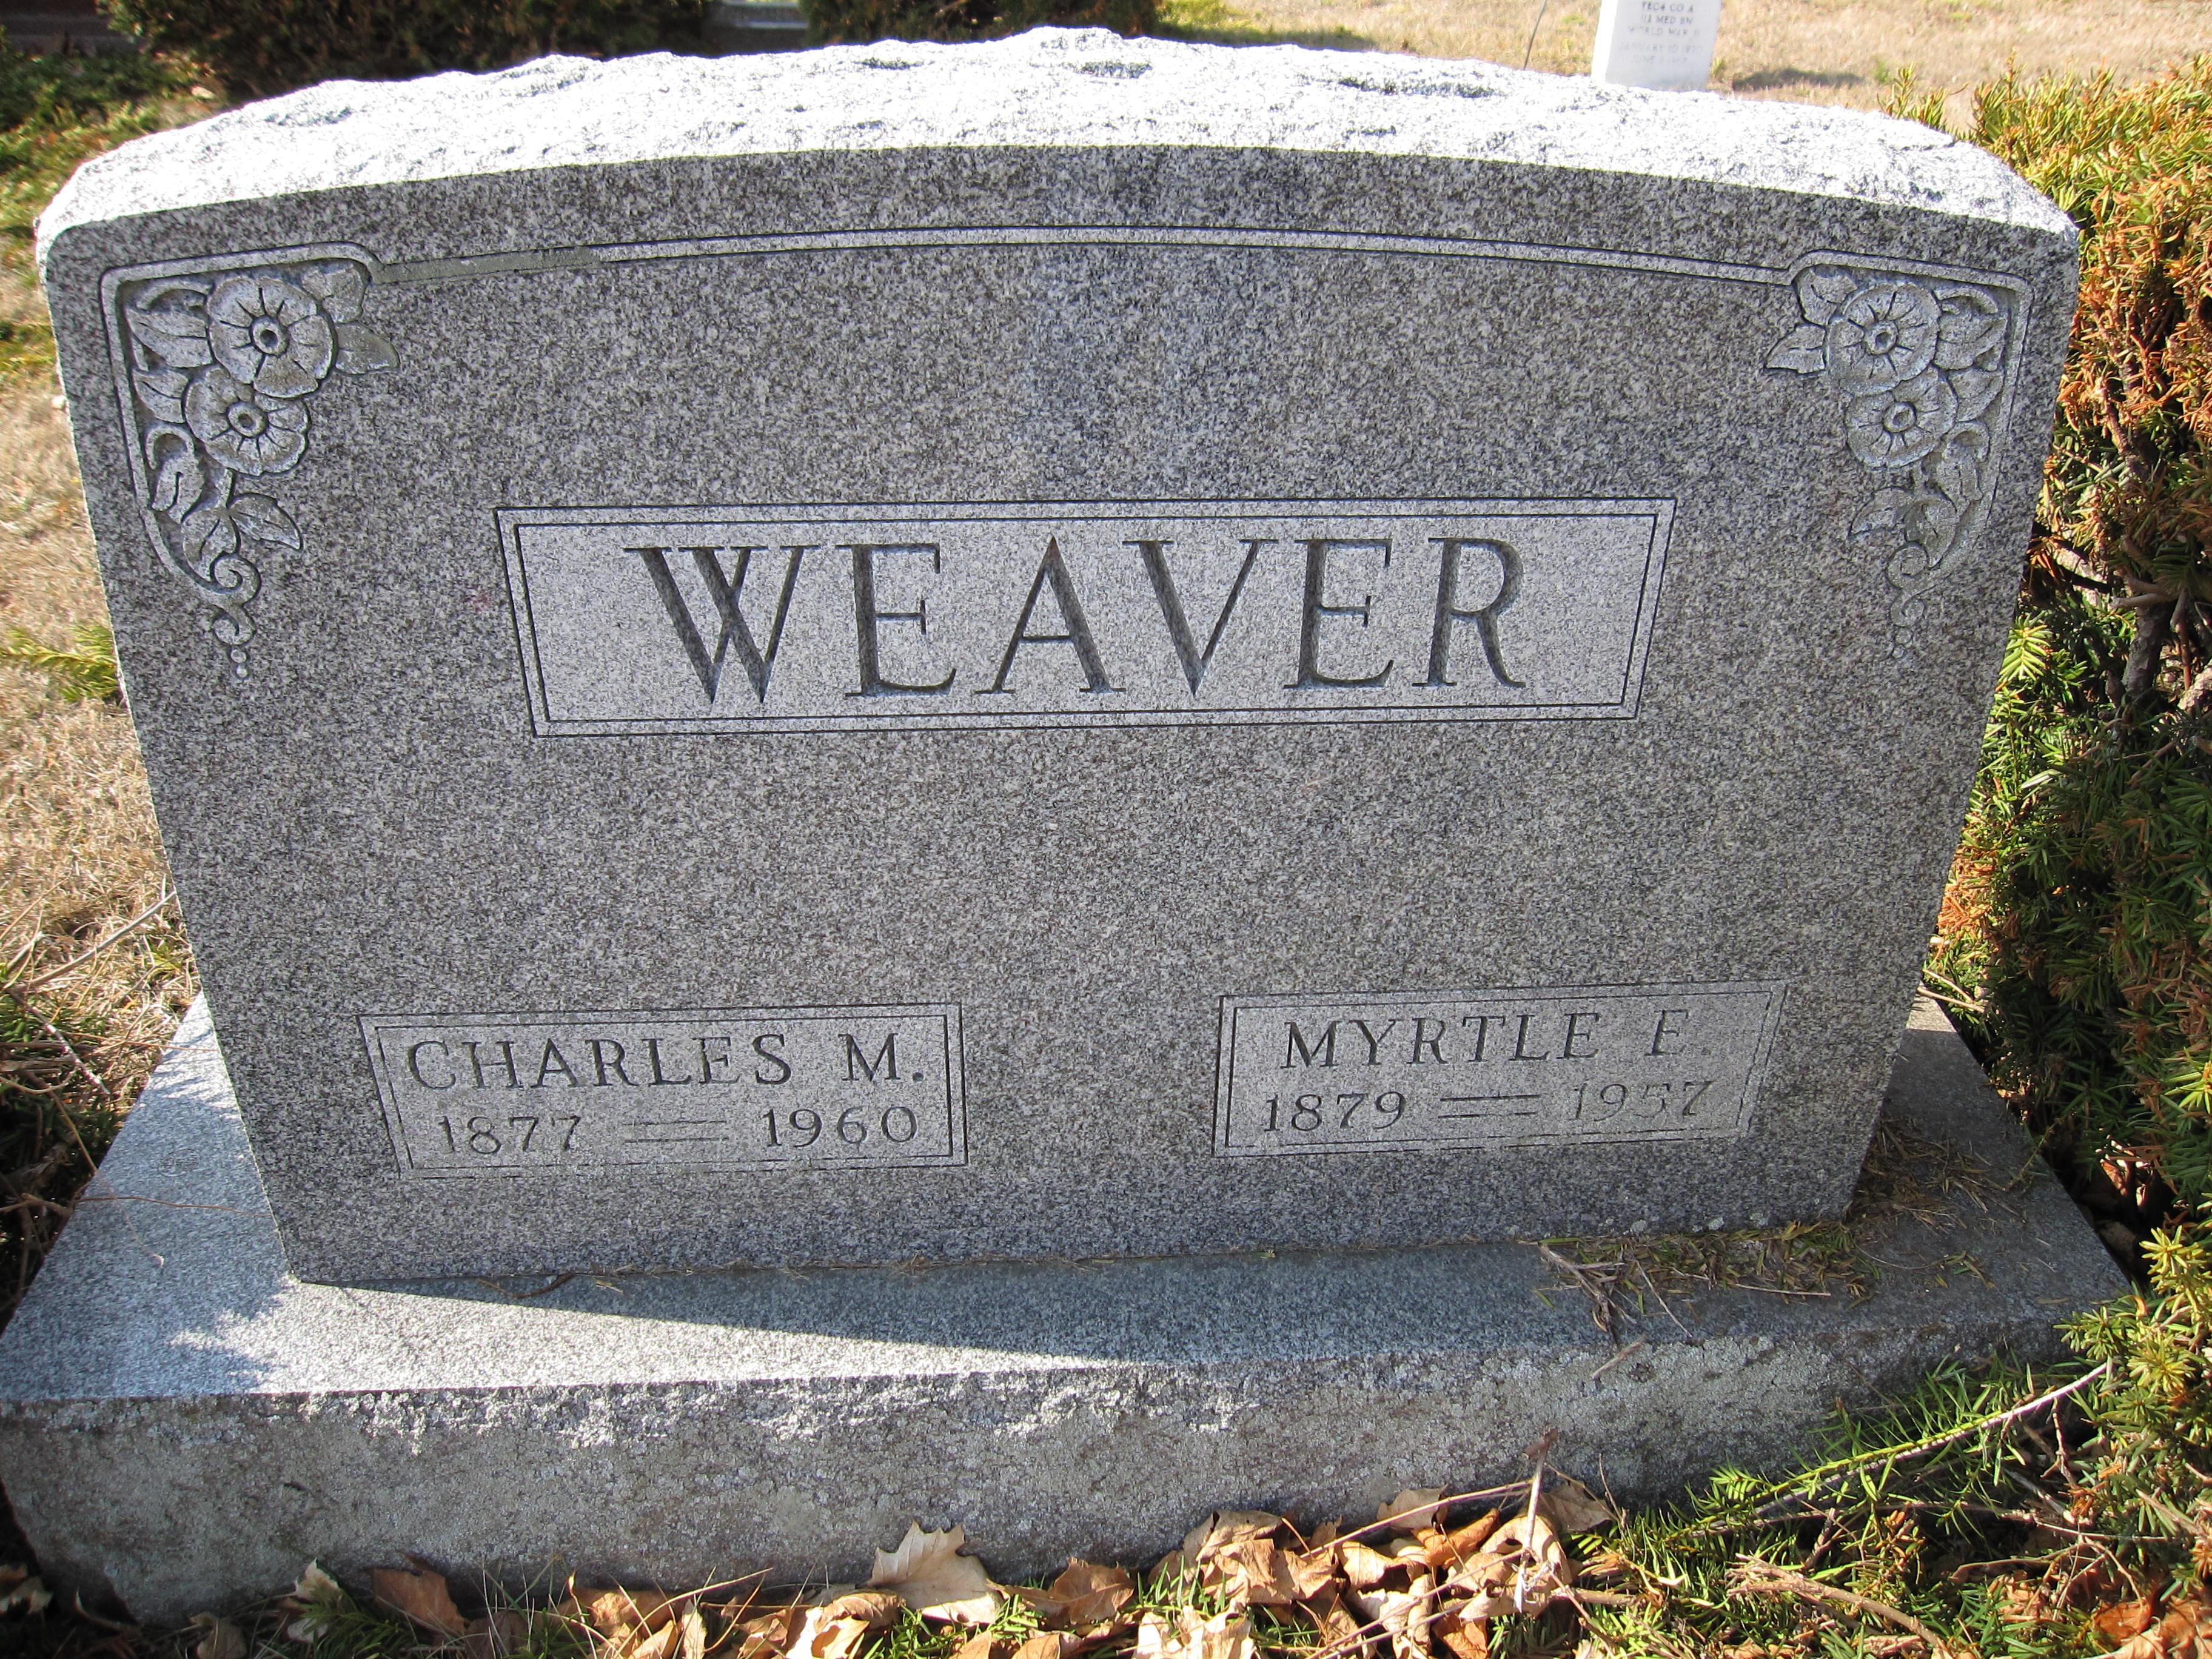 Charles M. Weaver